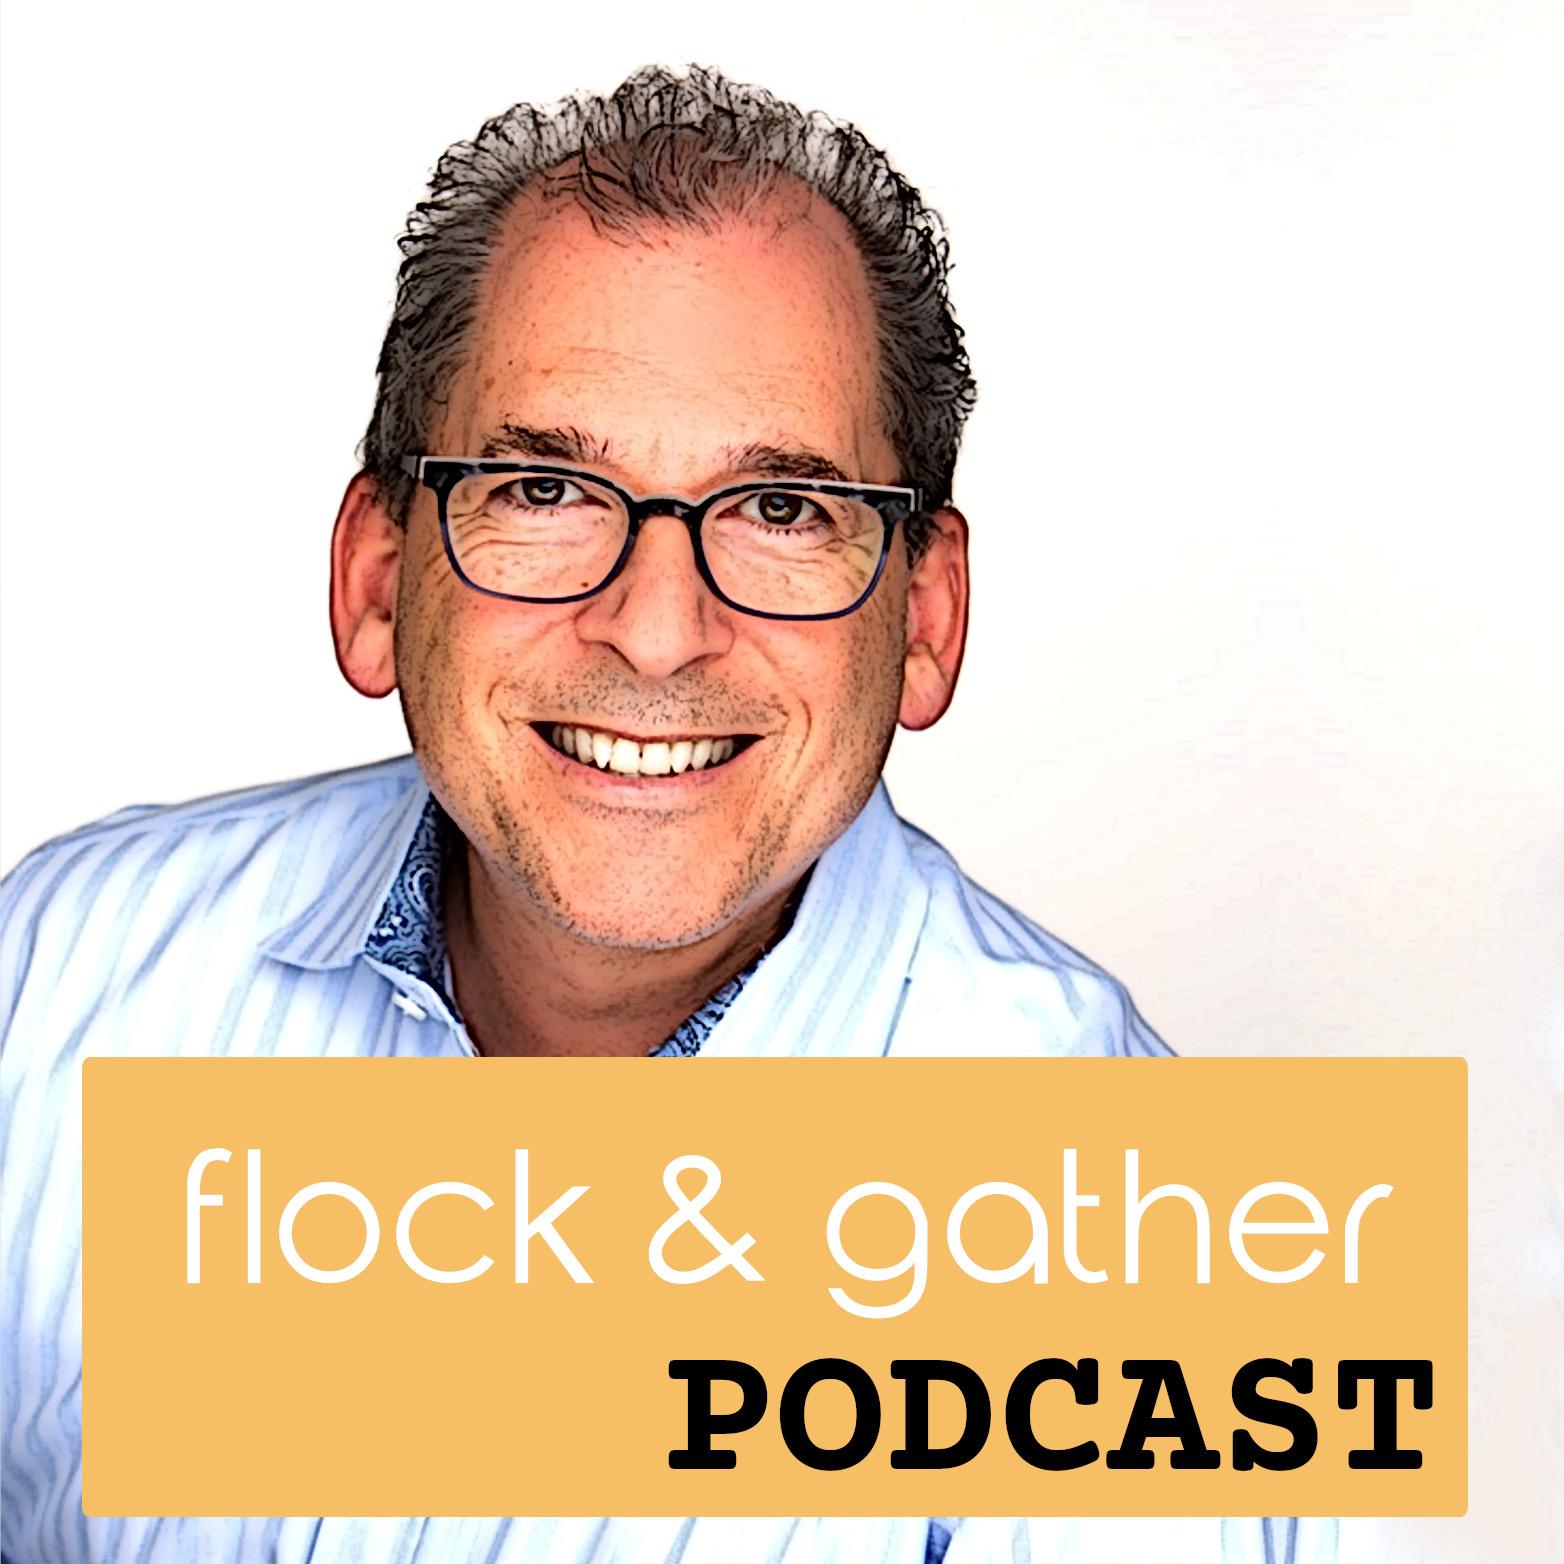 Flock and Gather Podcast.  New episodes featuring Diane Waltersdorf, David Bremer, Jennifer Rosenbaum and Lisa Kahn!!